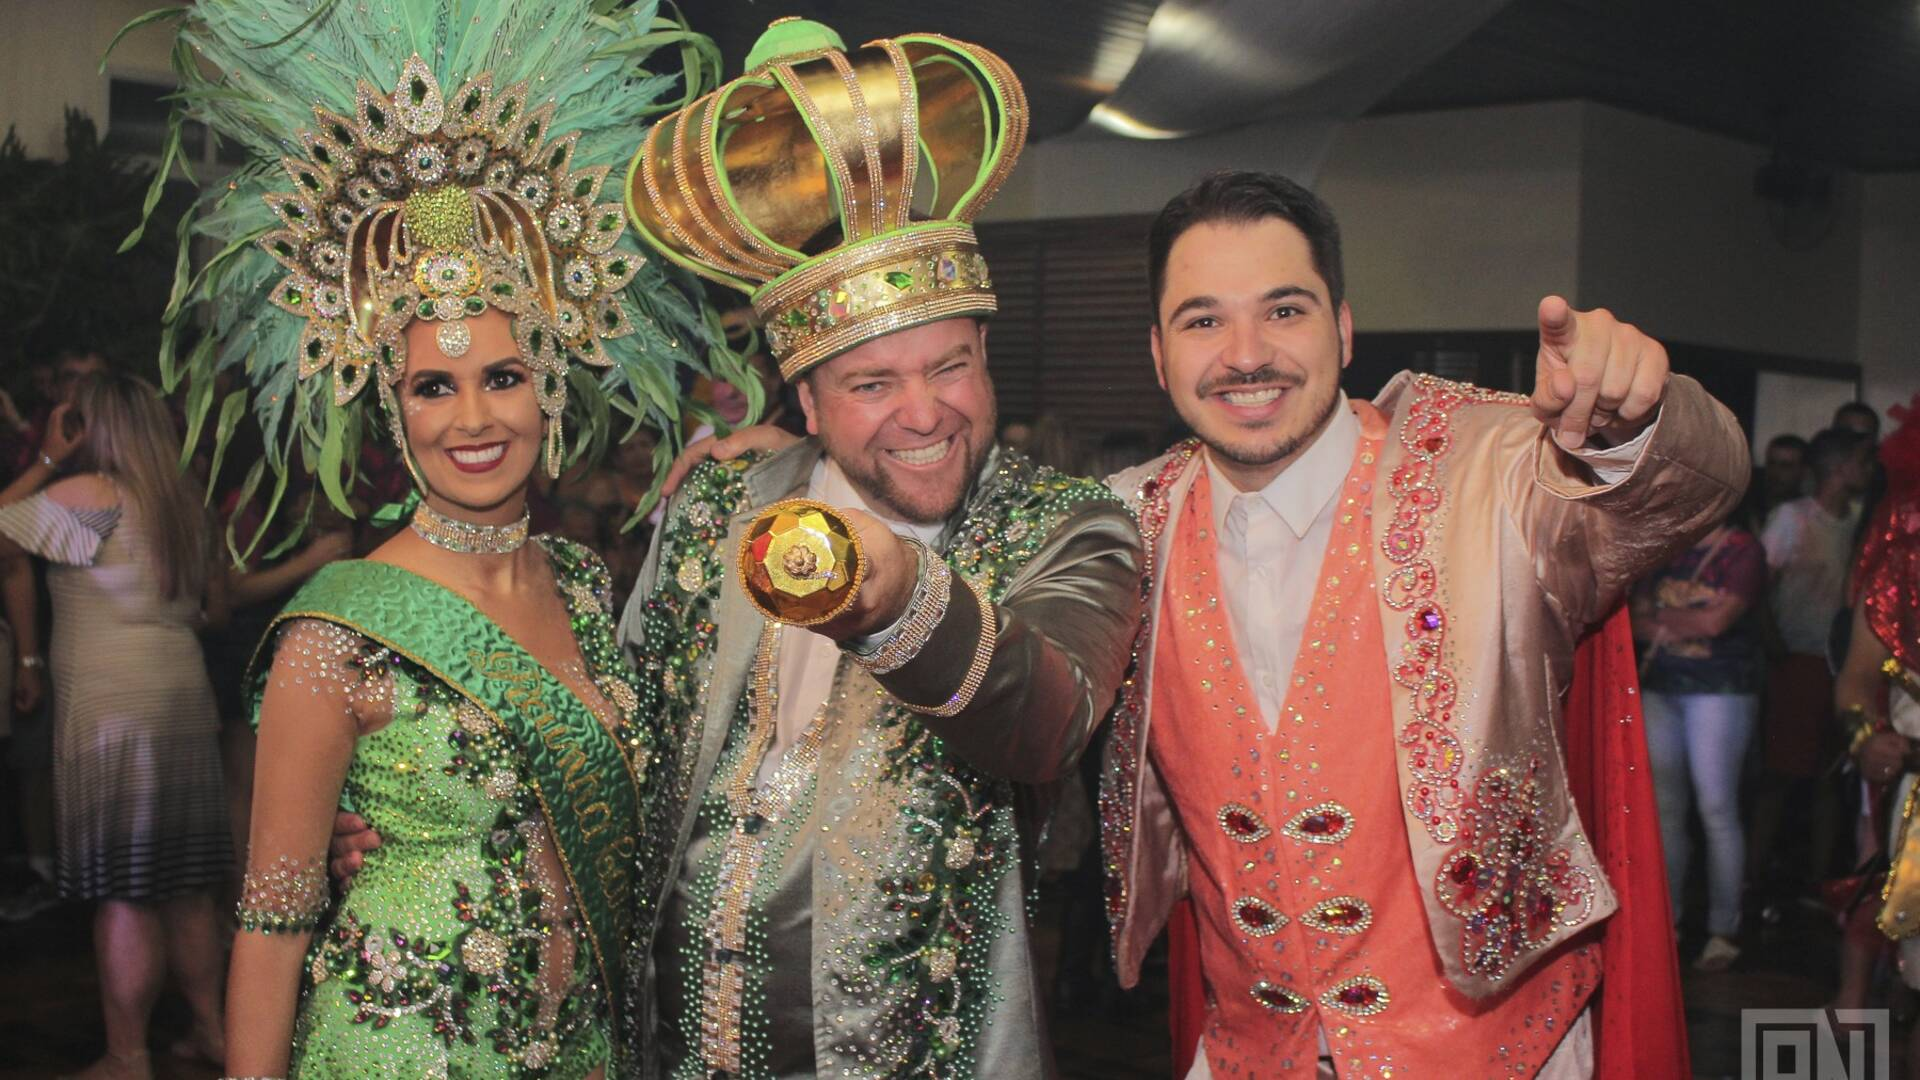 Festa de Carnaval Bom Jardim 2018